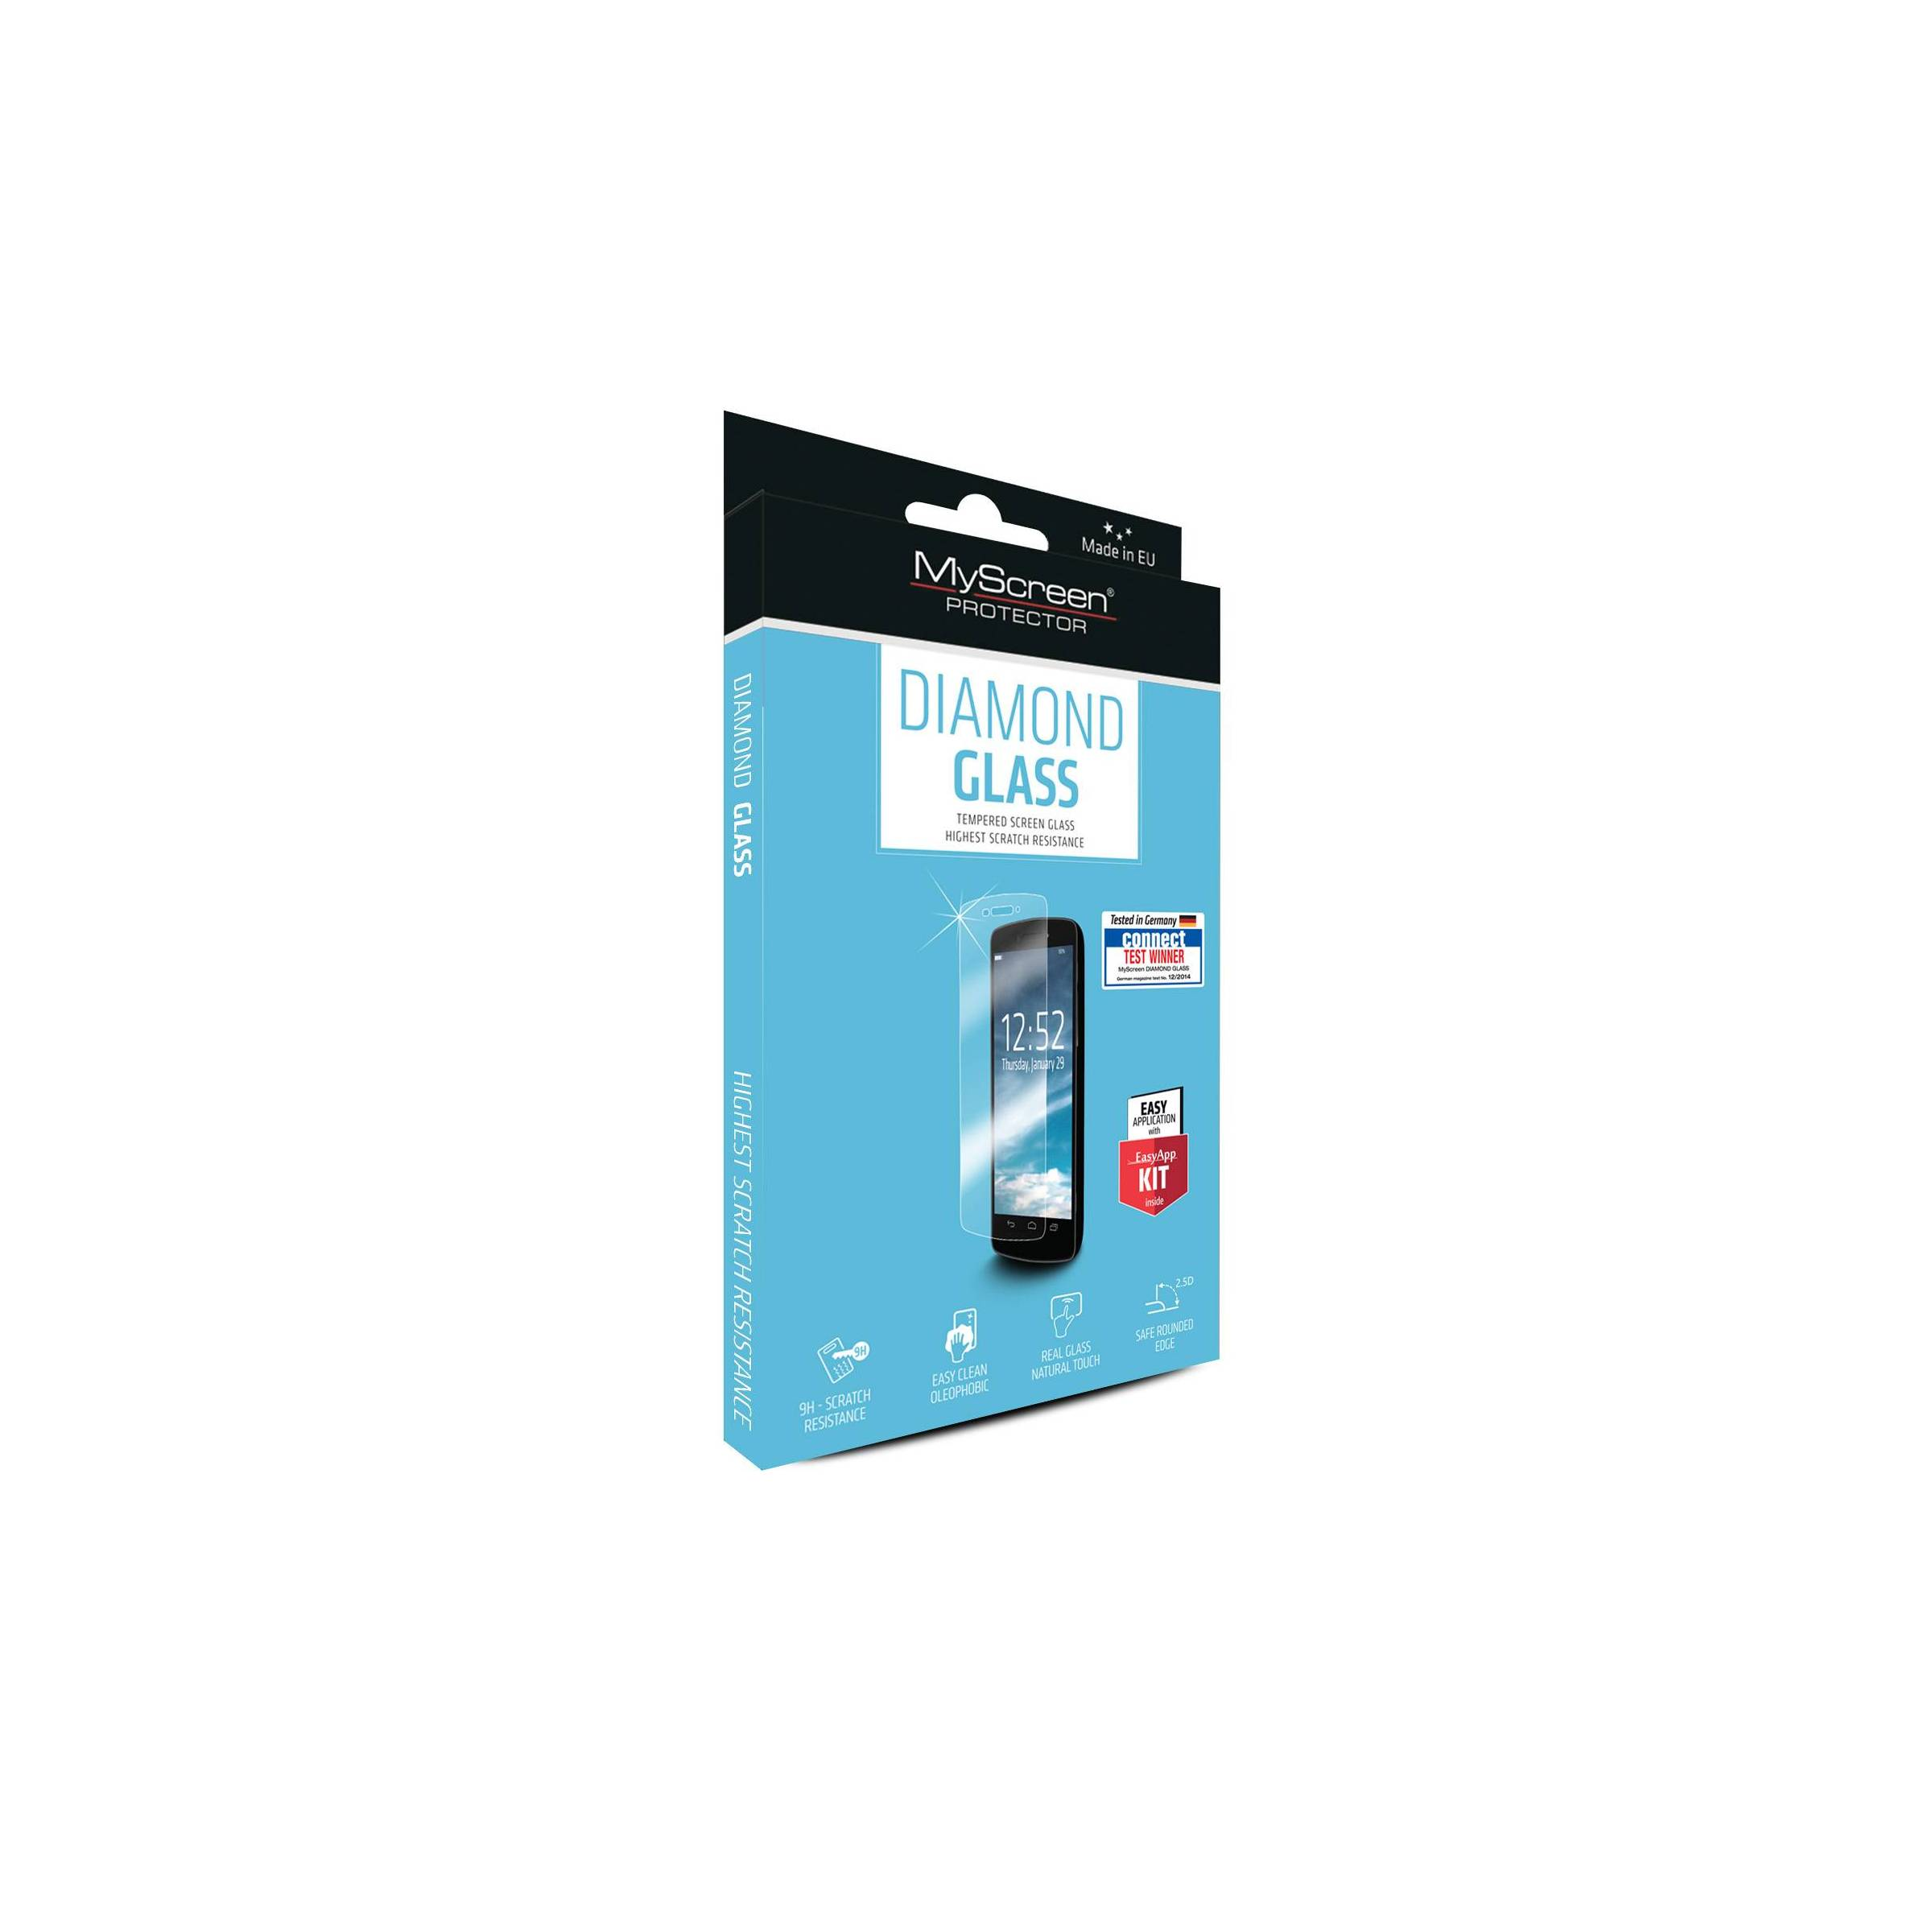 myscreen – Myscreen diamond iphone 7/8 plus beskyttelsesglas fra mackabler.dk